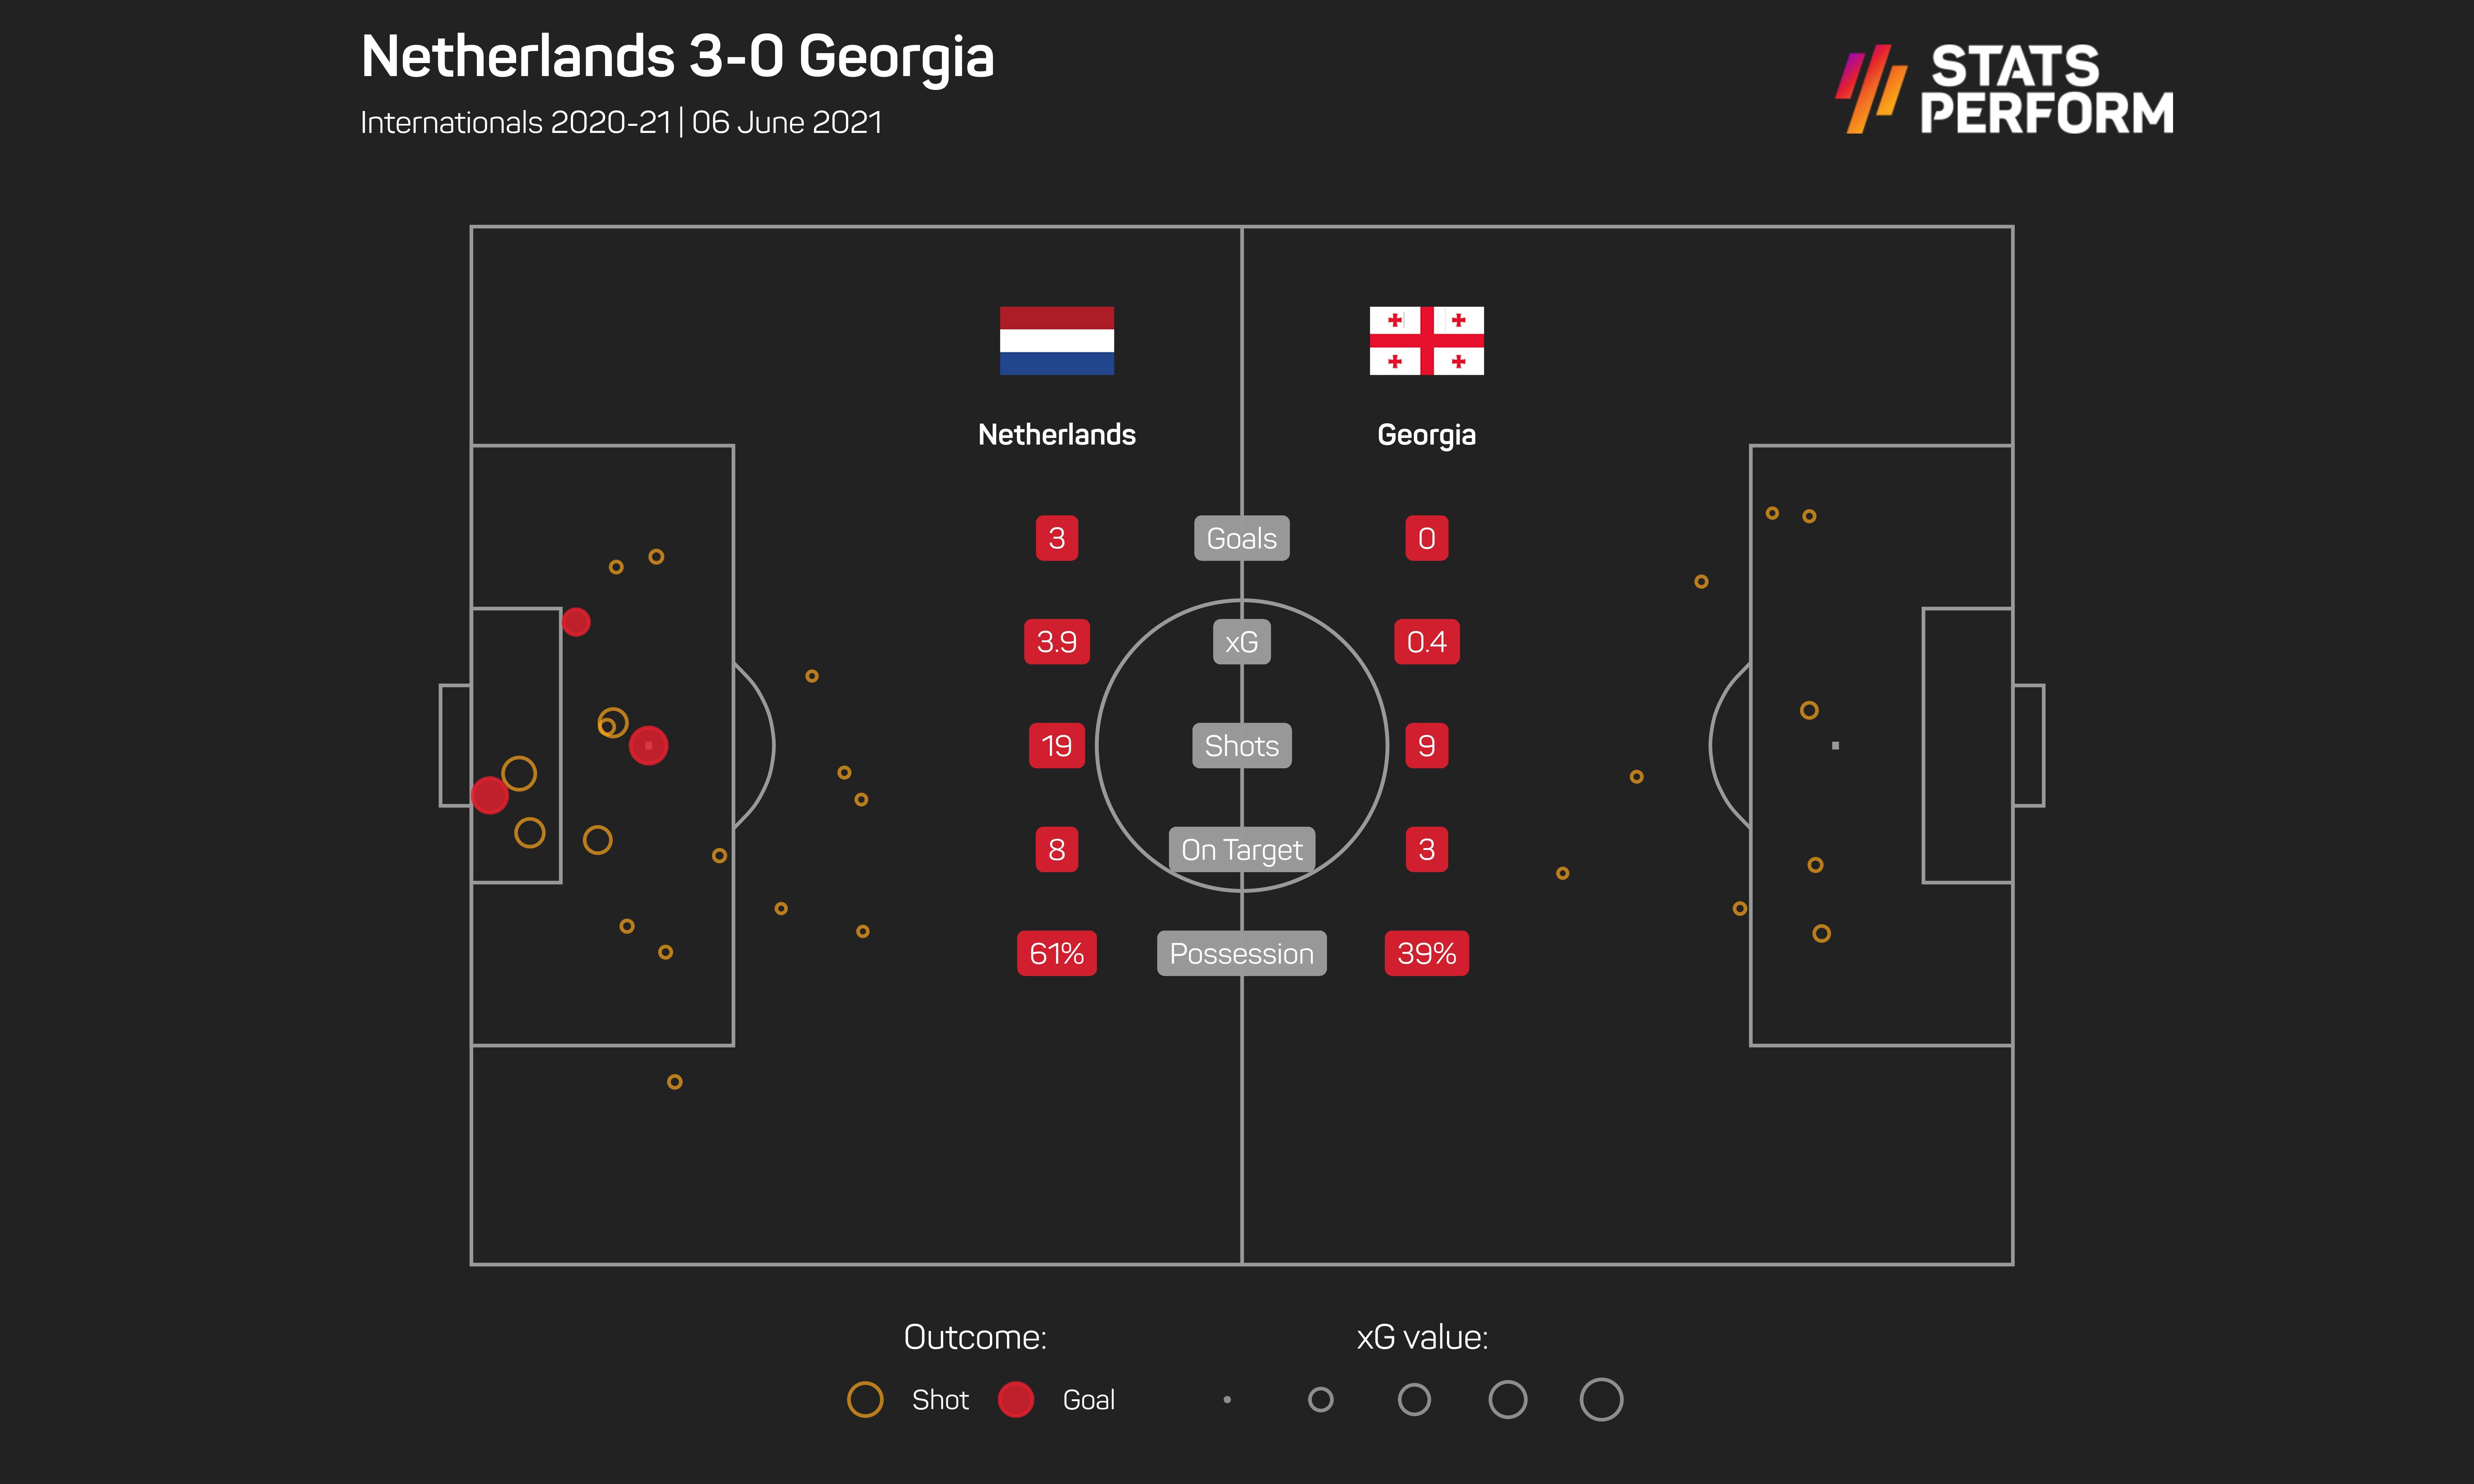 Netherlands vs Georgia, June 2021